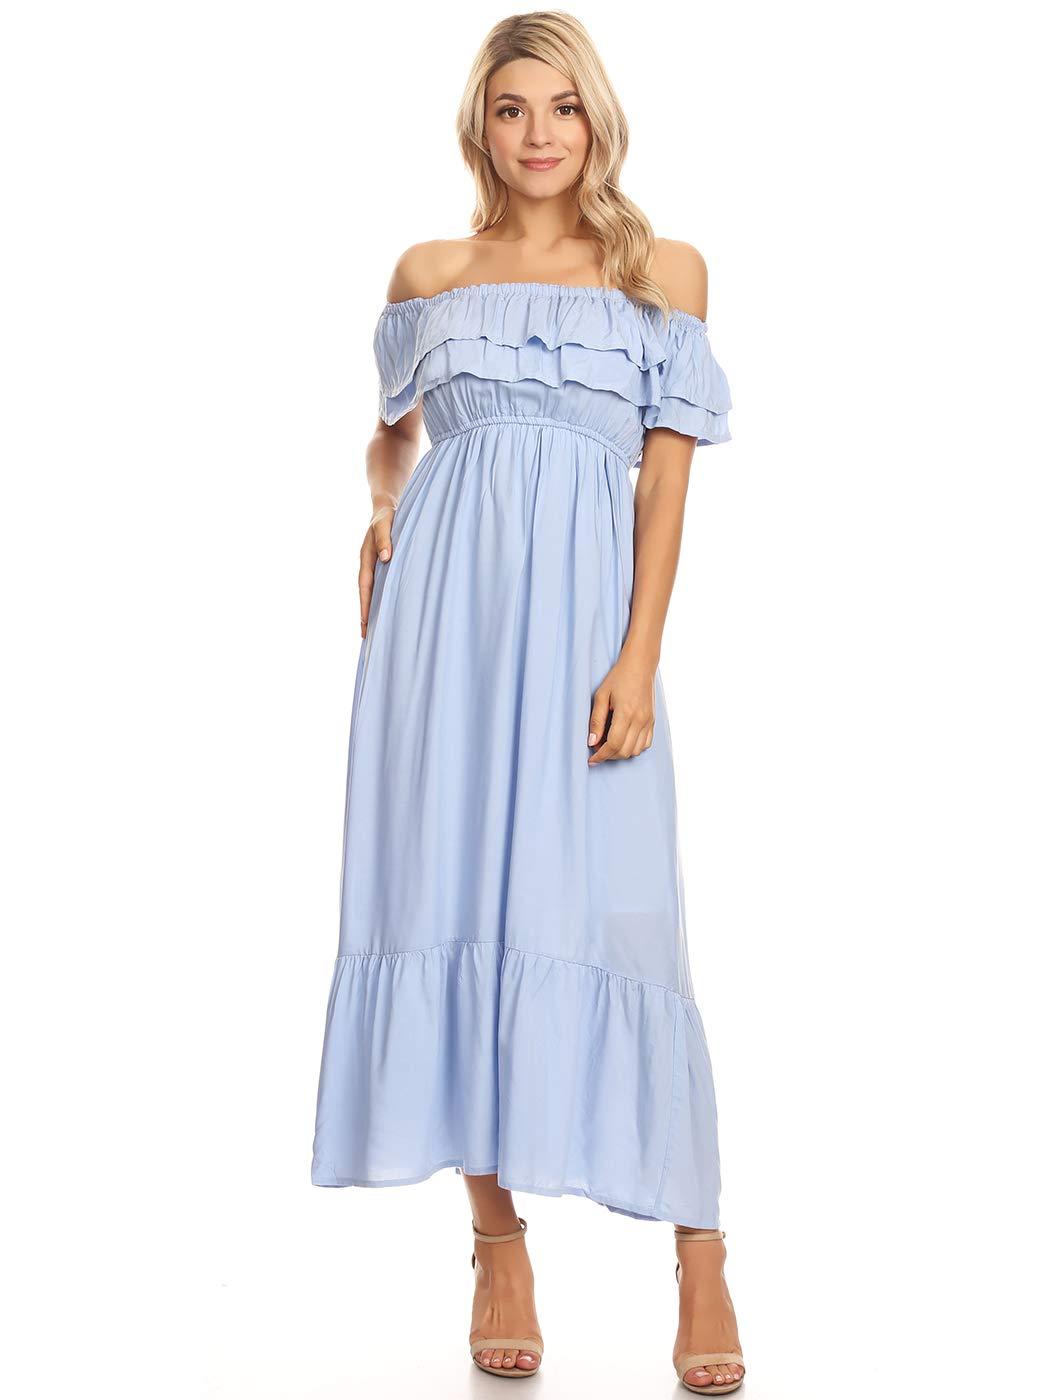 Available at Amazon: Anna-Kaci Women's Boho Peasant Ruffle Stretchy Short Sleeve Long Dress